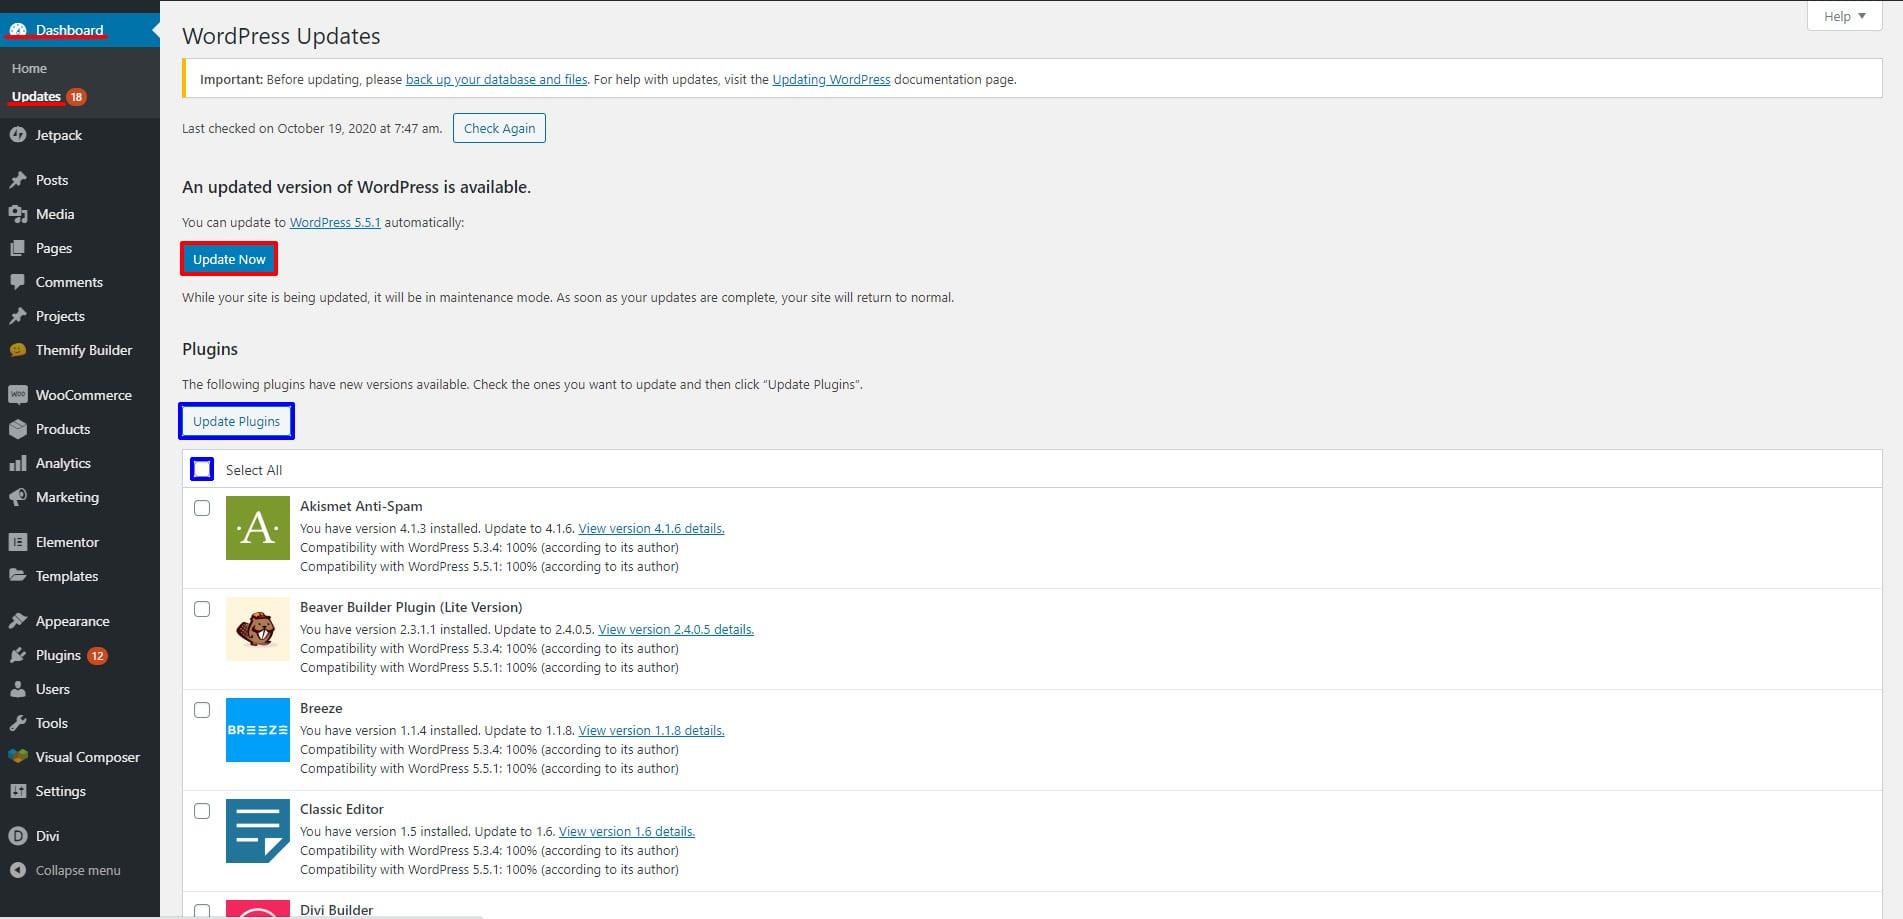 Failed to Load Resource error in WordPress